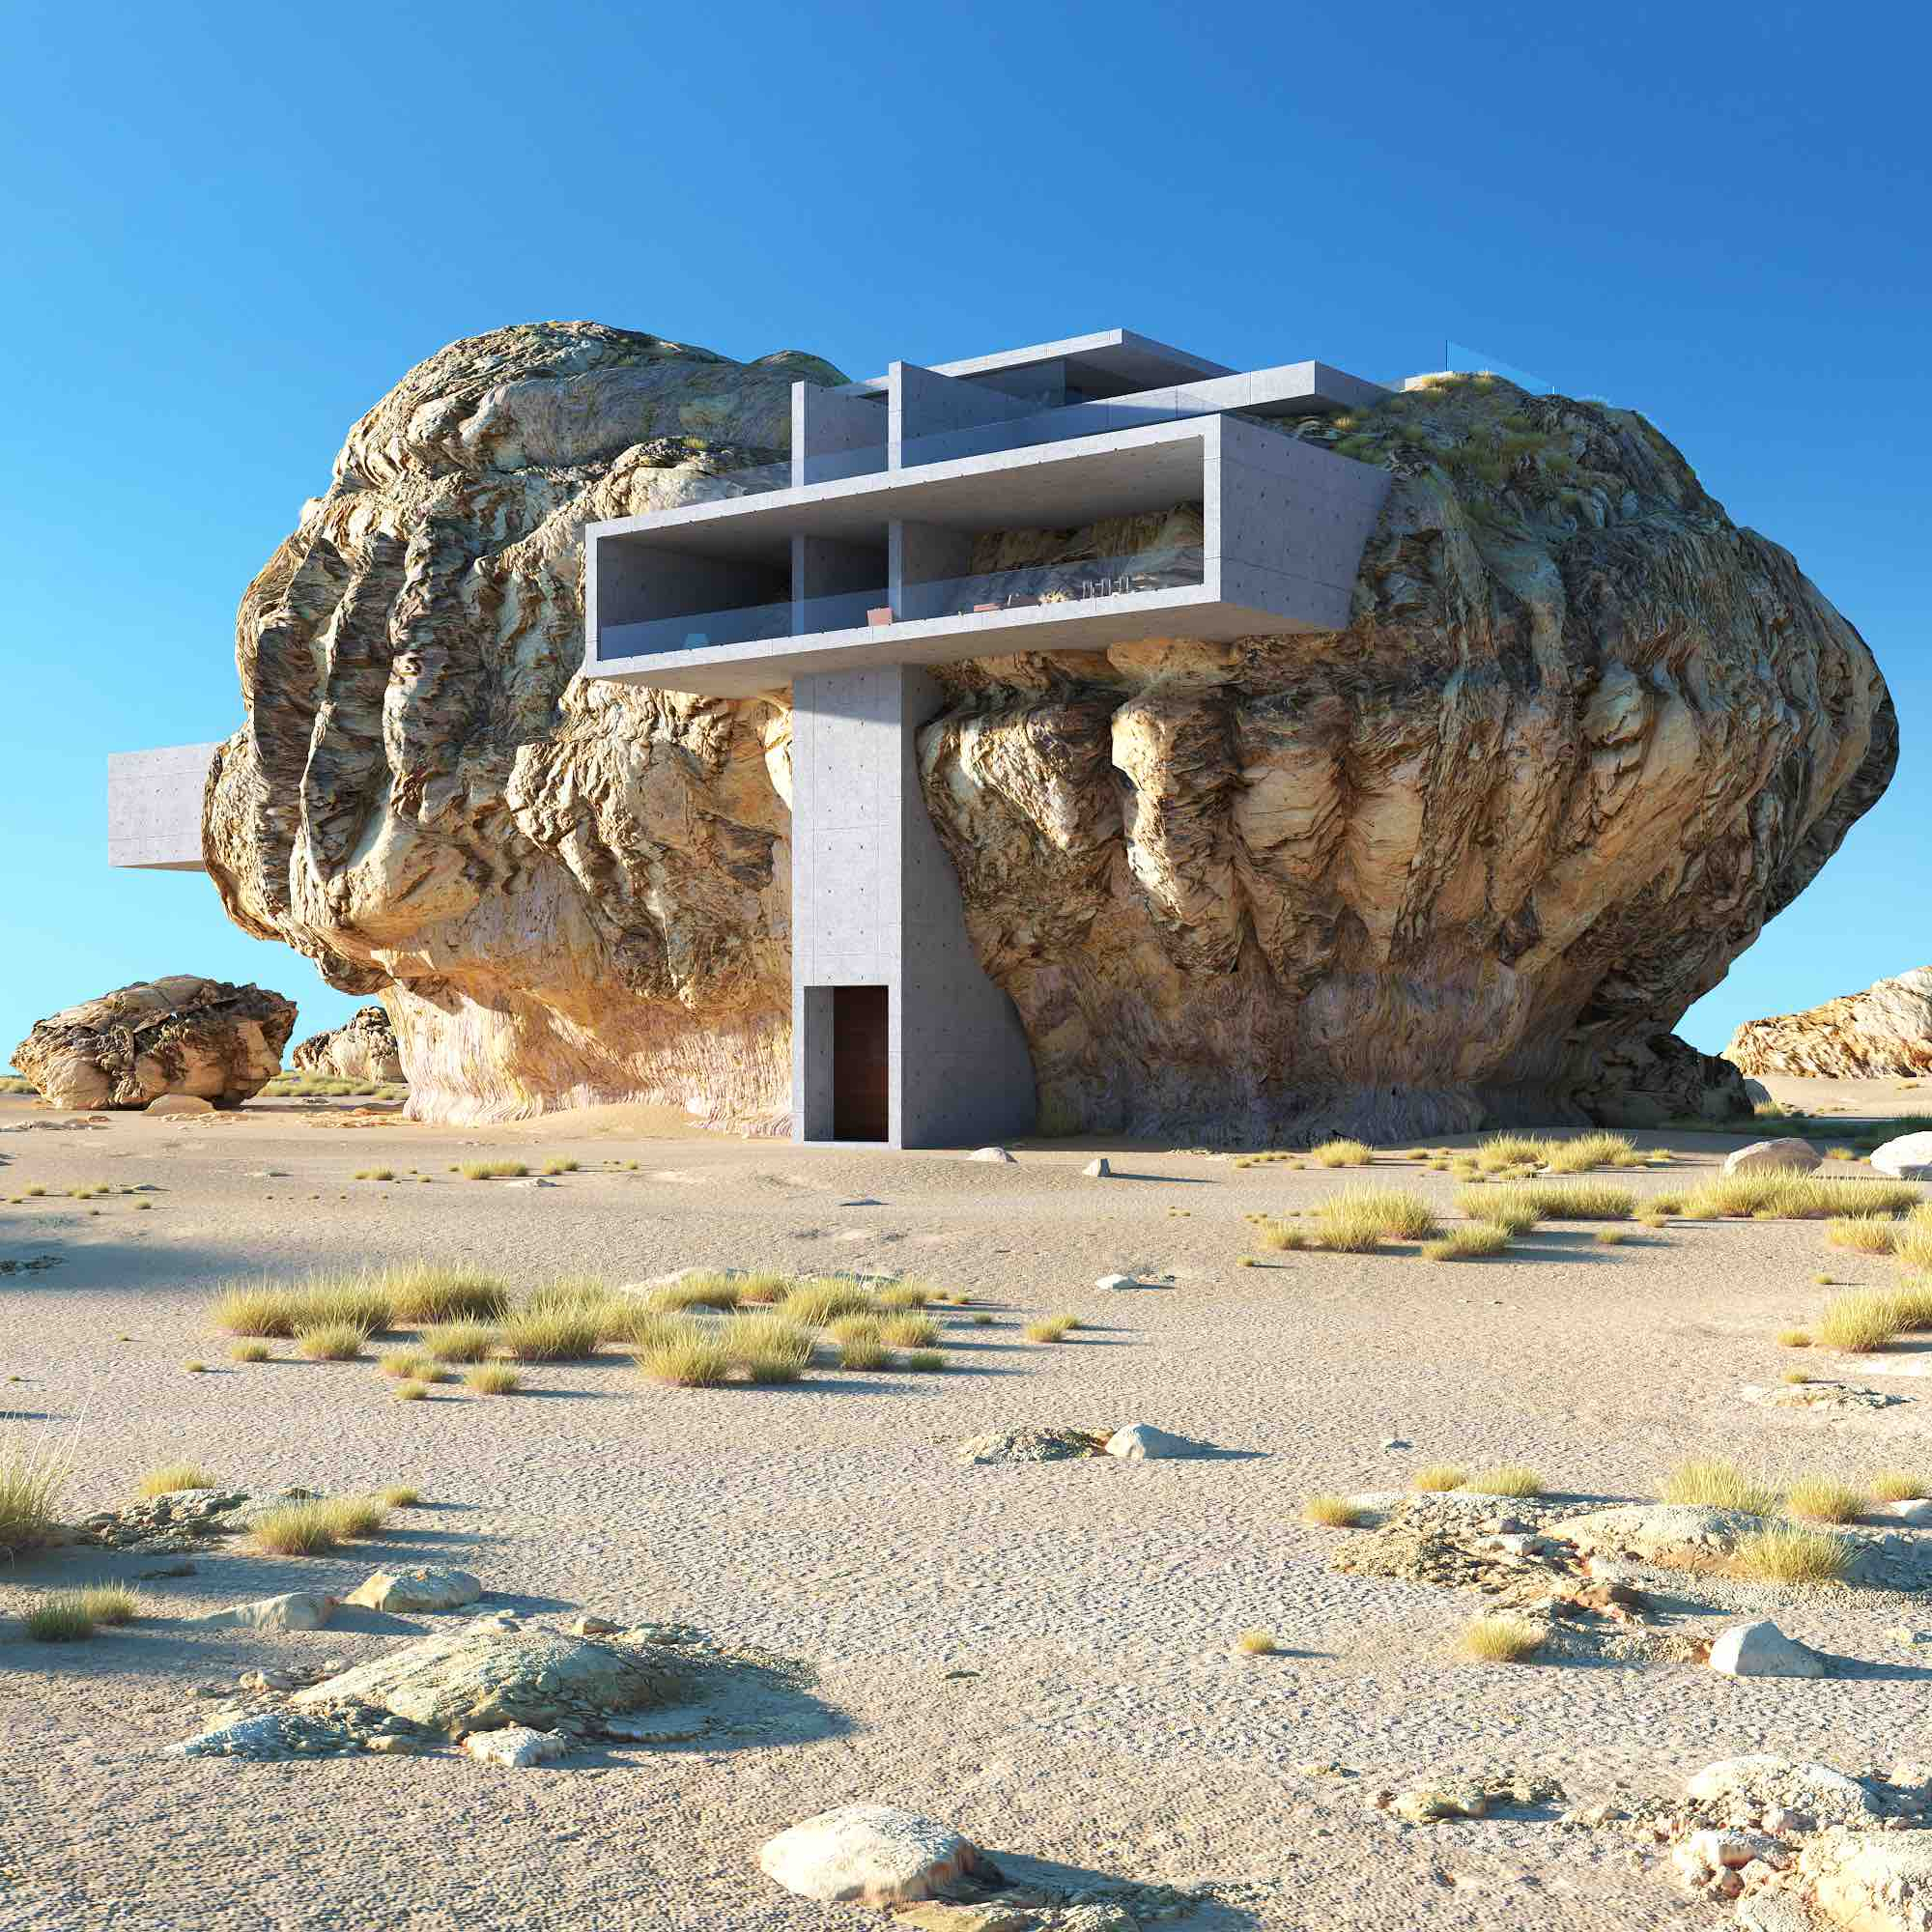 House-inside-a-rock-Amey-Kandalgaonkar-SaudiArabia-004.jpg